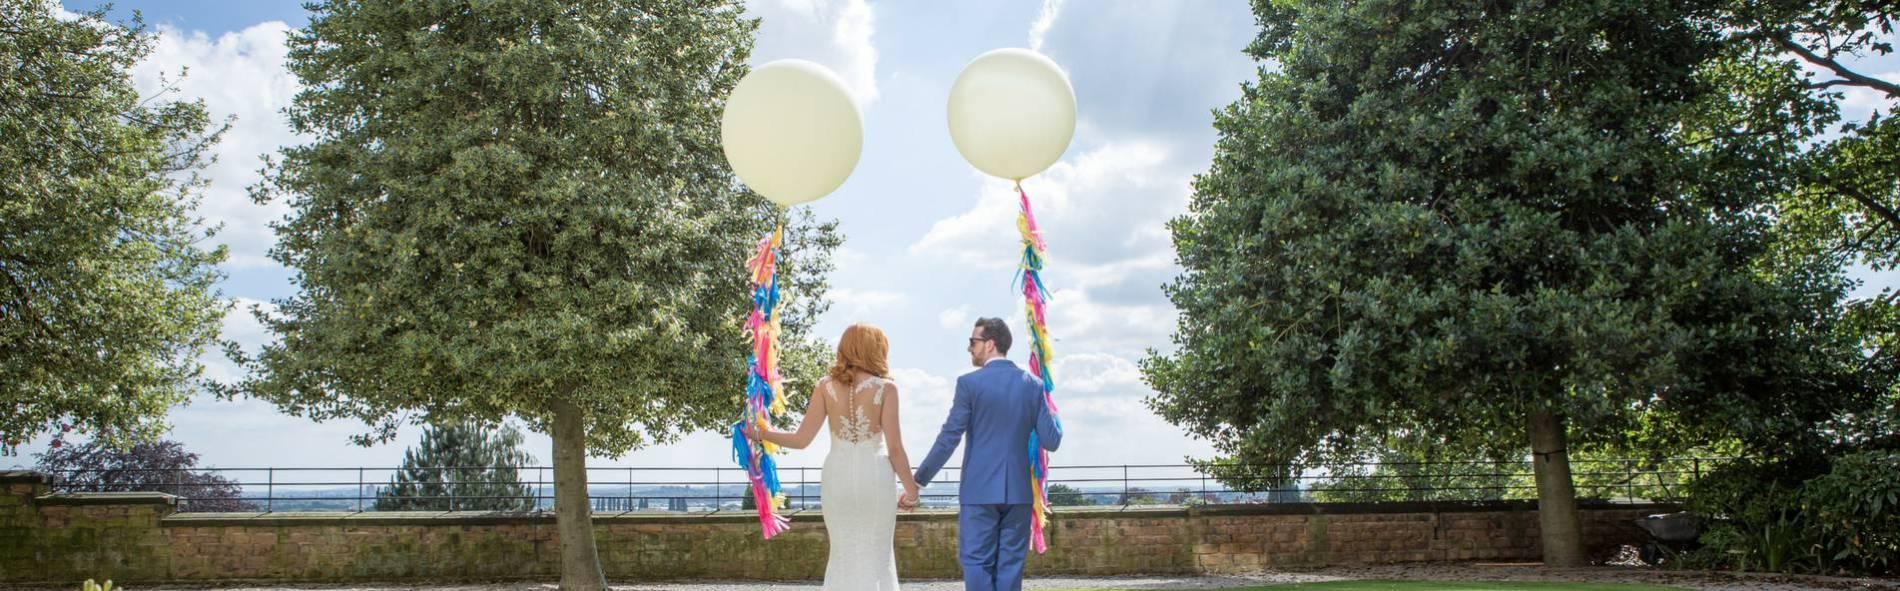 Alternative unconventional wedding - balloons colour